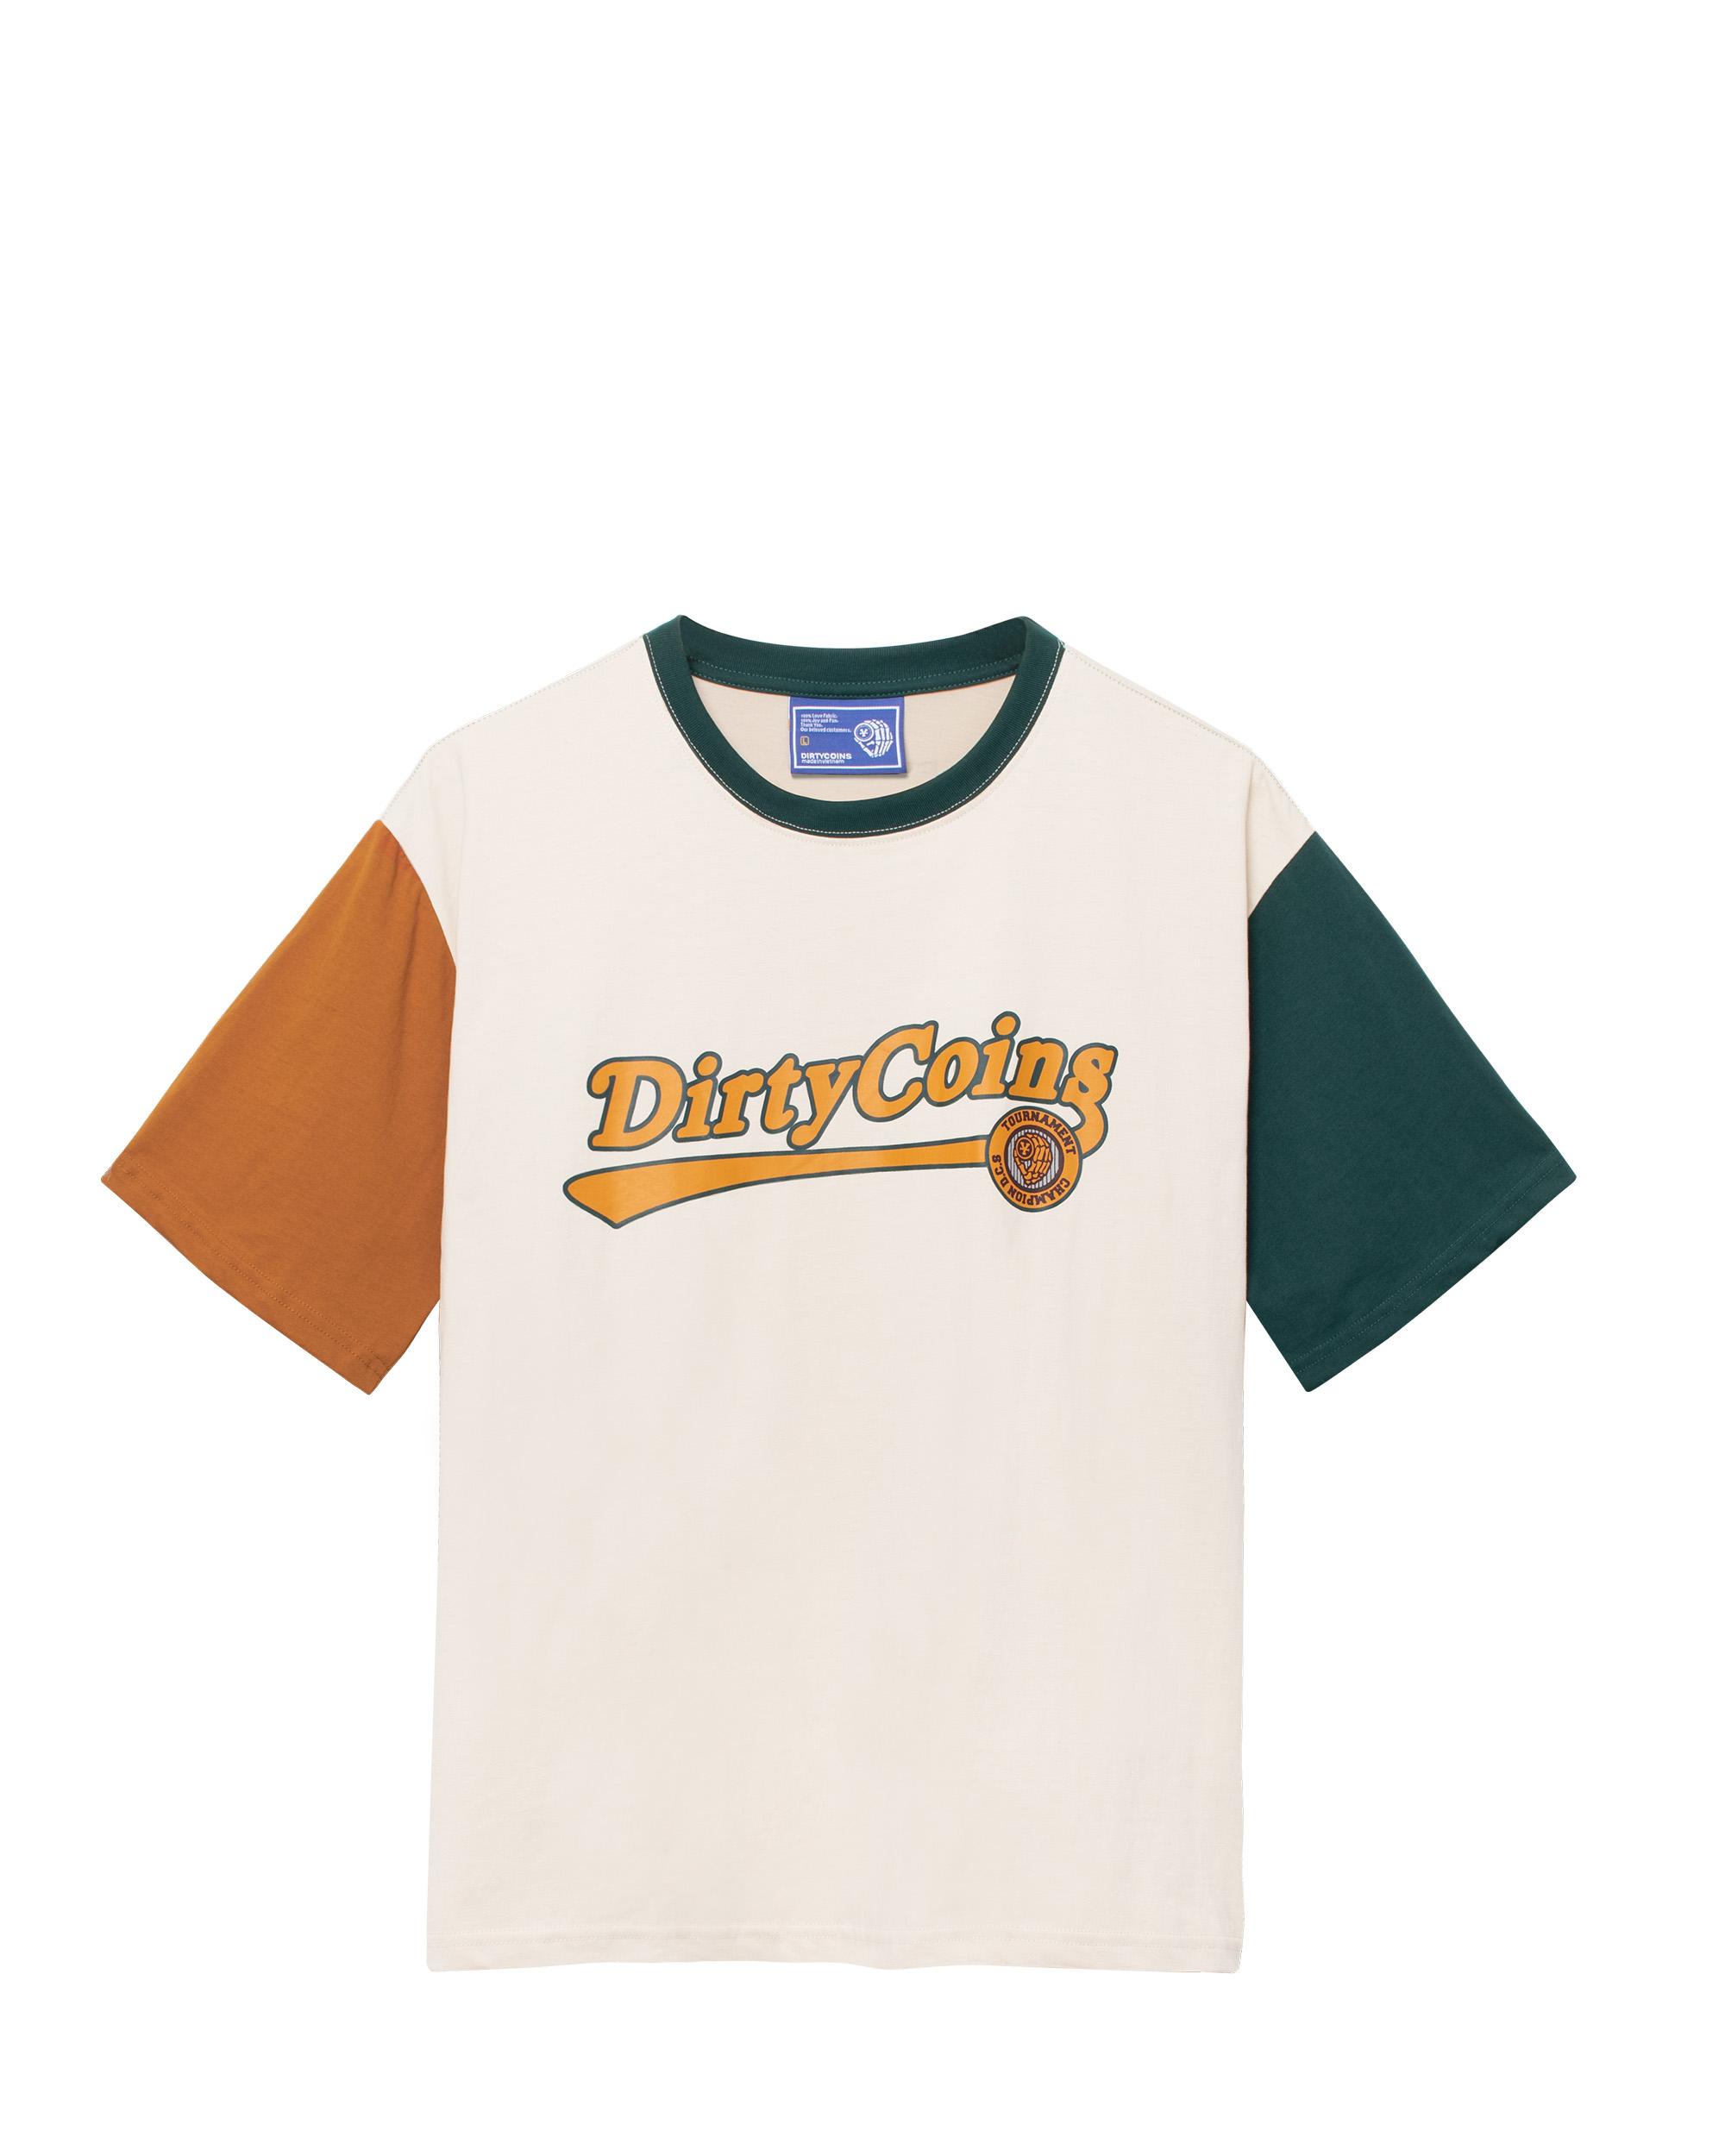 DirtyCoins Big Logo Jacket - Orange/White